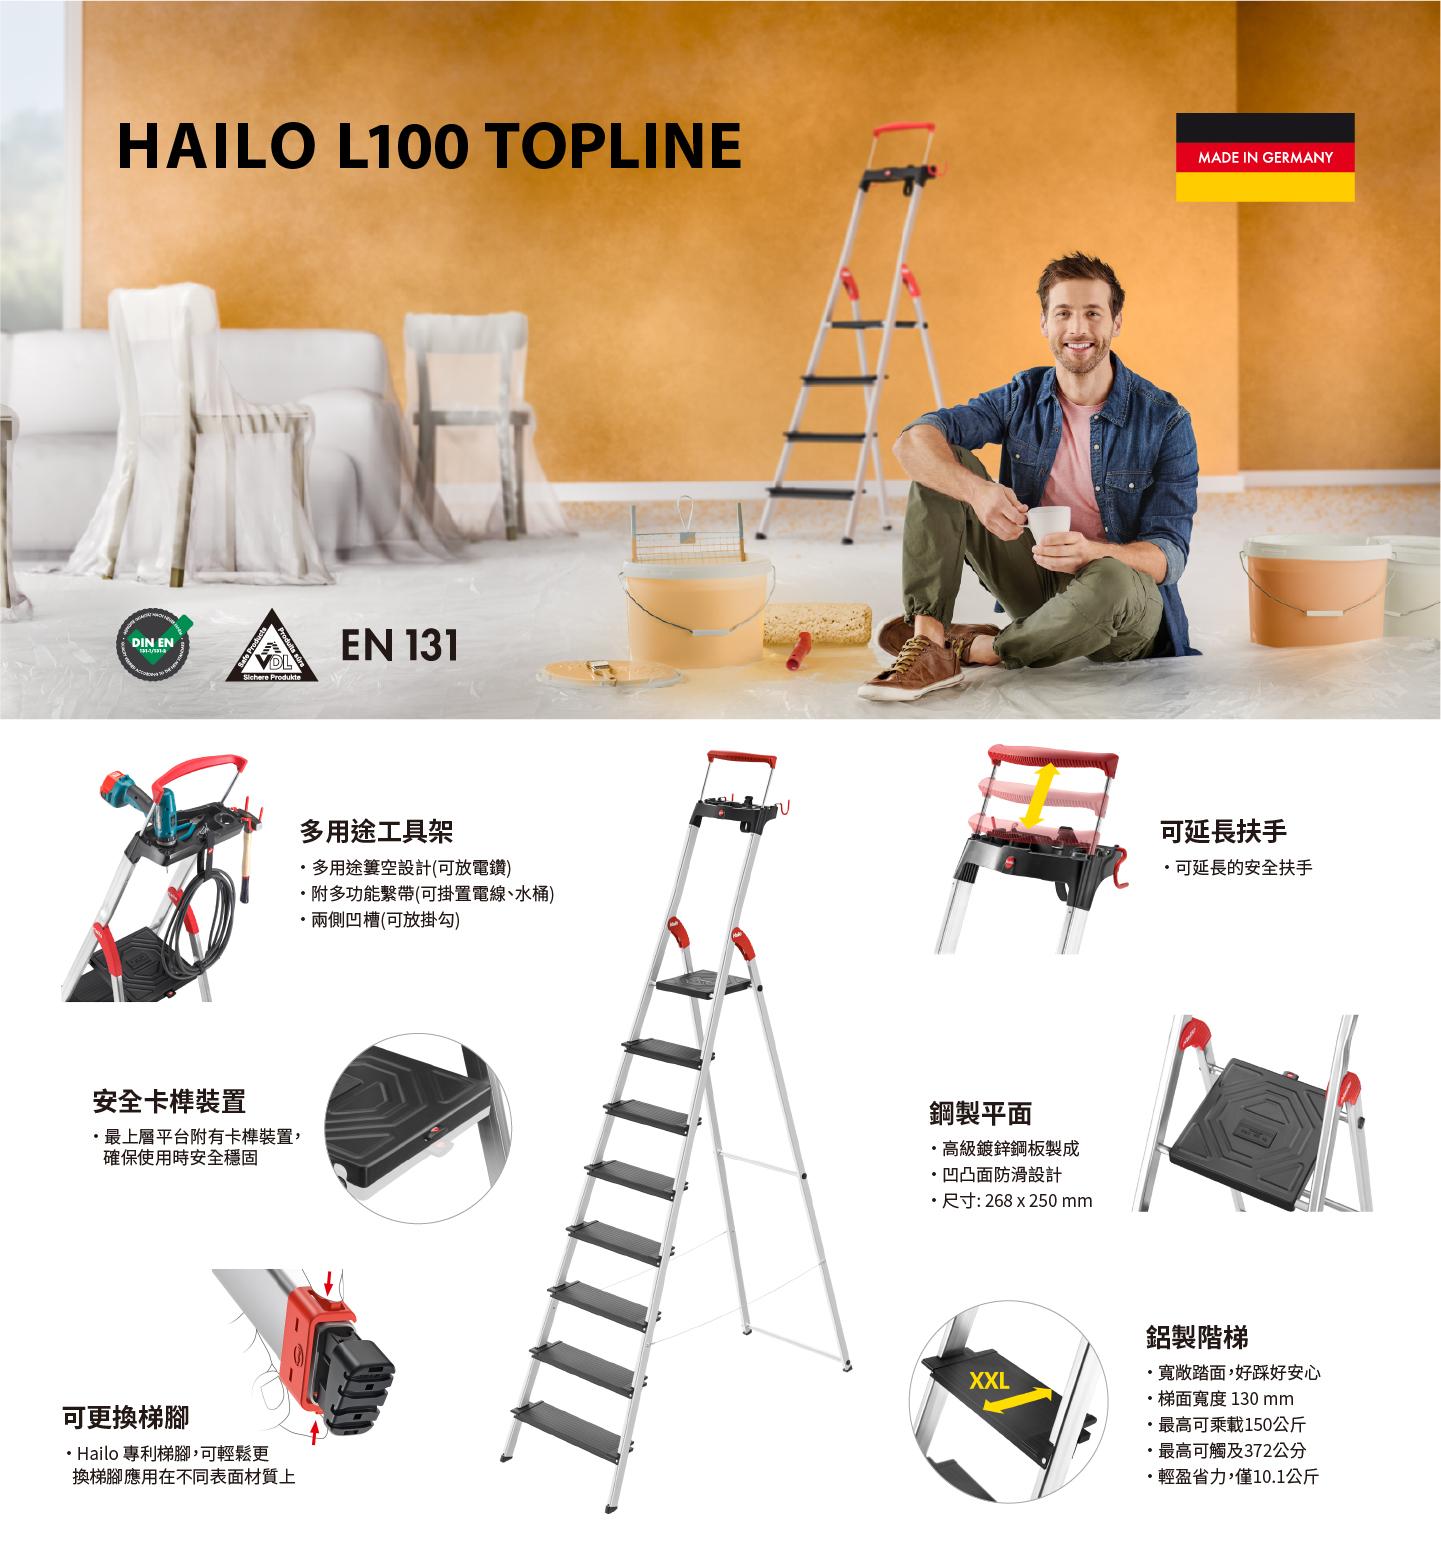 Hailo-L100Topline-8steps